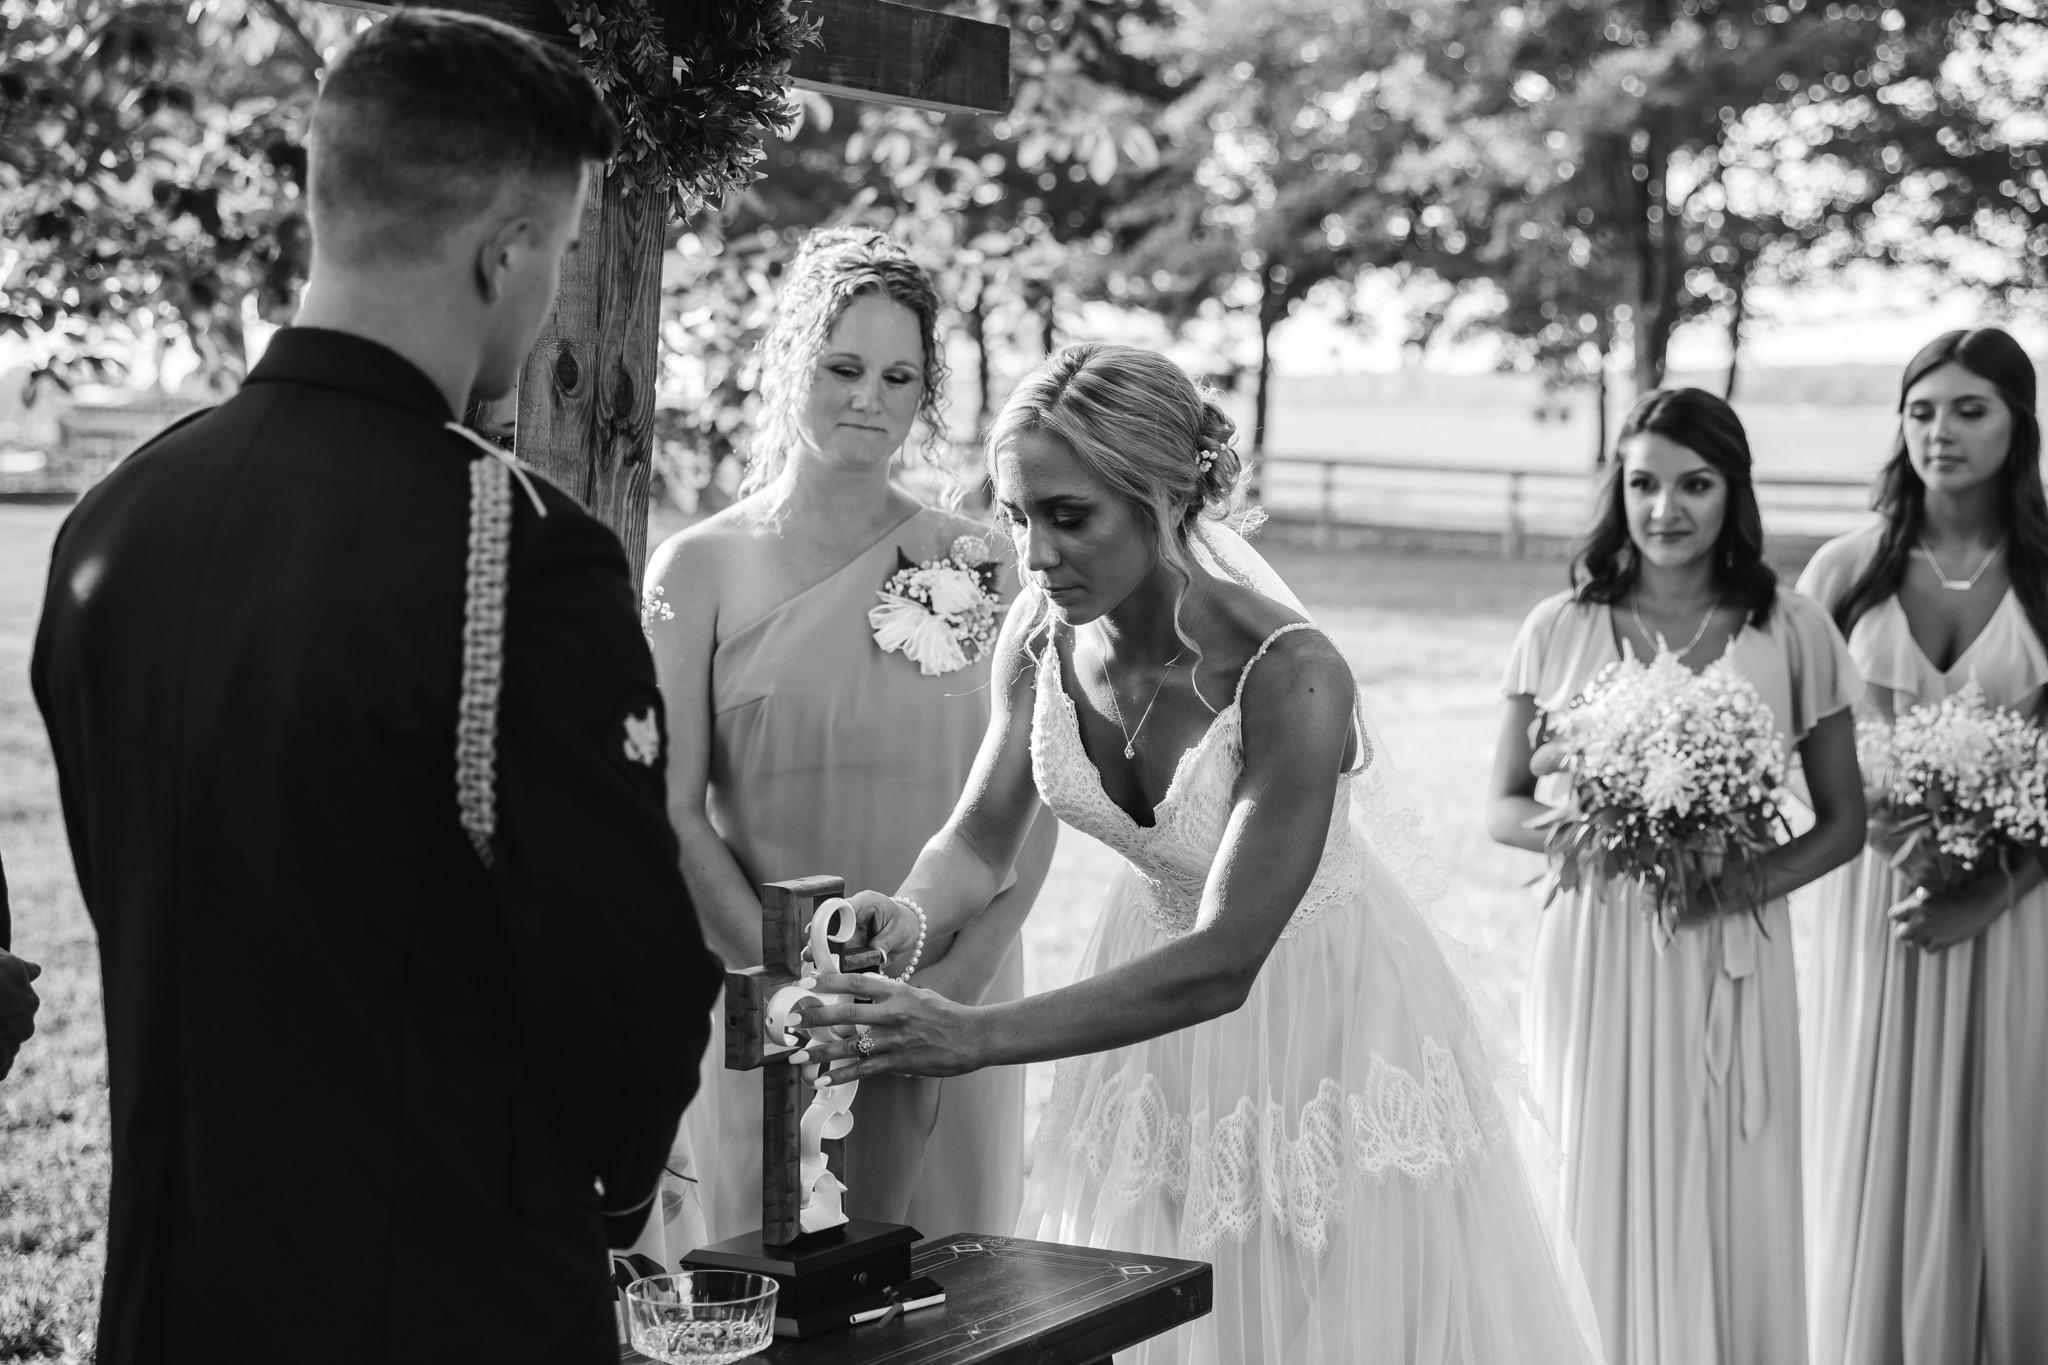 zbackyard-wedding-thewarmtharoundyou-lexy-branson-407.jpg